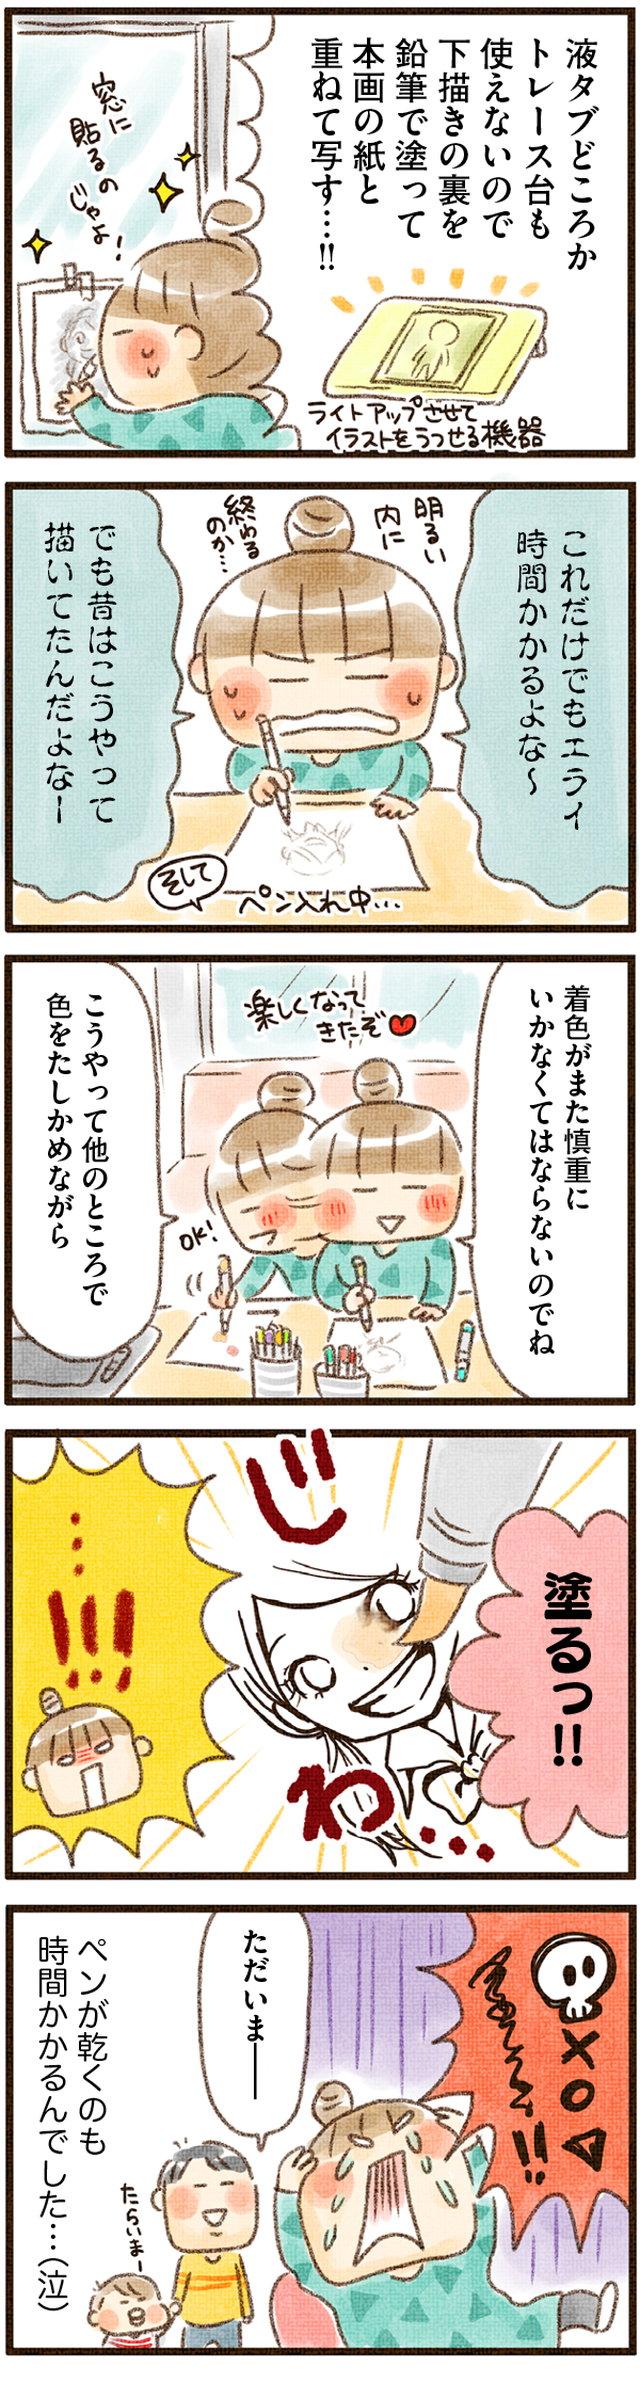 katano3_2.jpeg